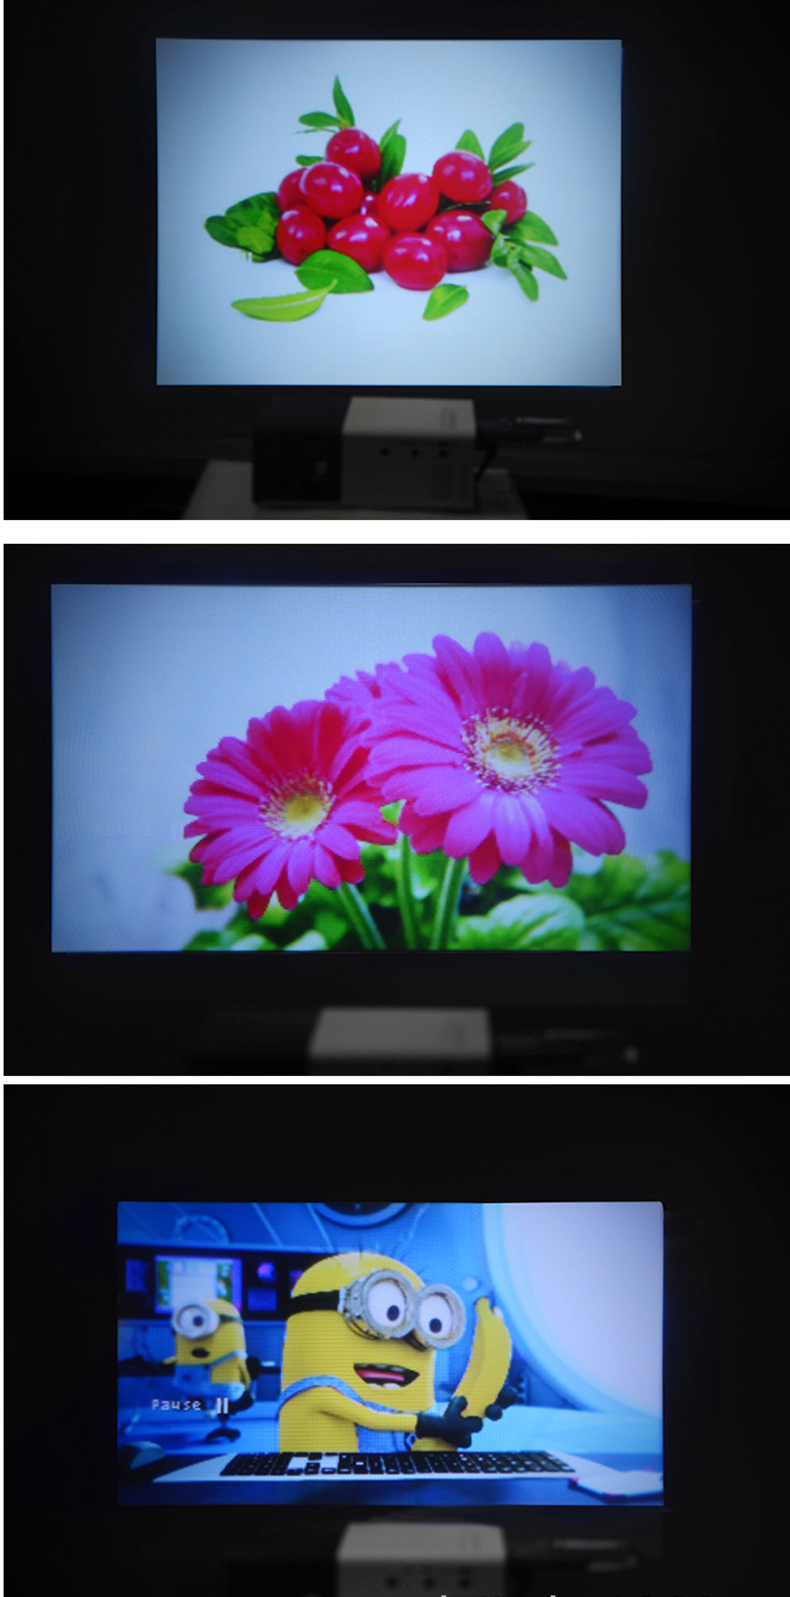 Excelvan YG320 Mini Projector Led Proyector Projetor 500LM Audio HDMI USB Mini YG-320 Projetor Home Theater Media Player Beamer (18)